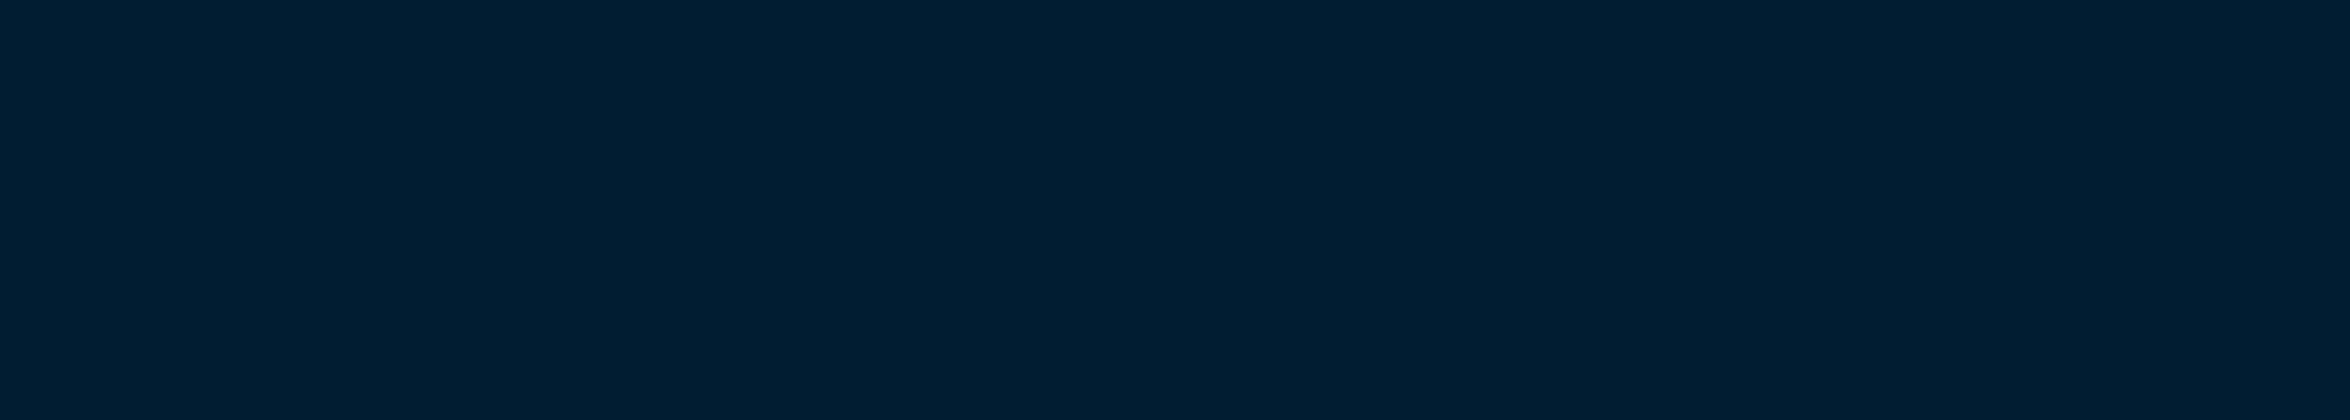 https://fbrconstruction.com/wp-content/uploads/2019/05/blue_gradient.png